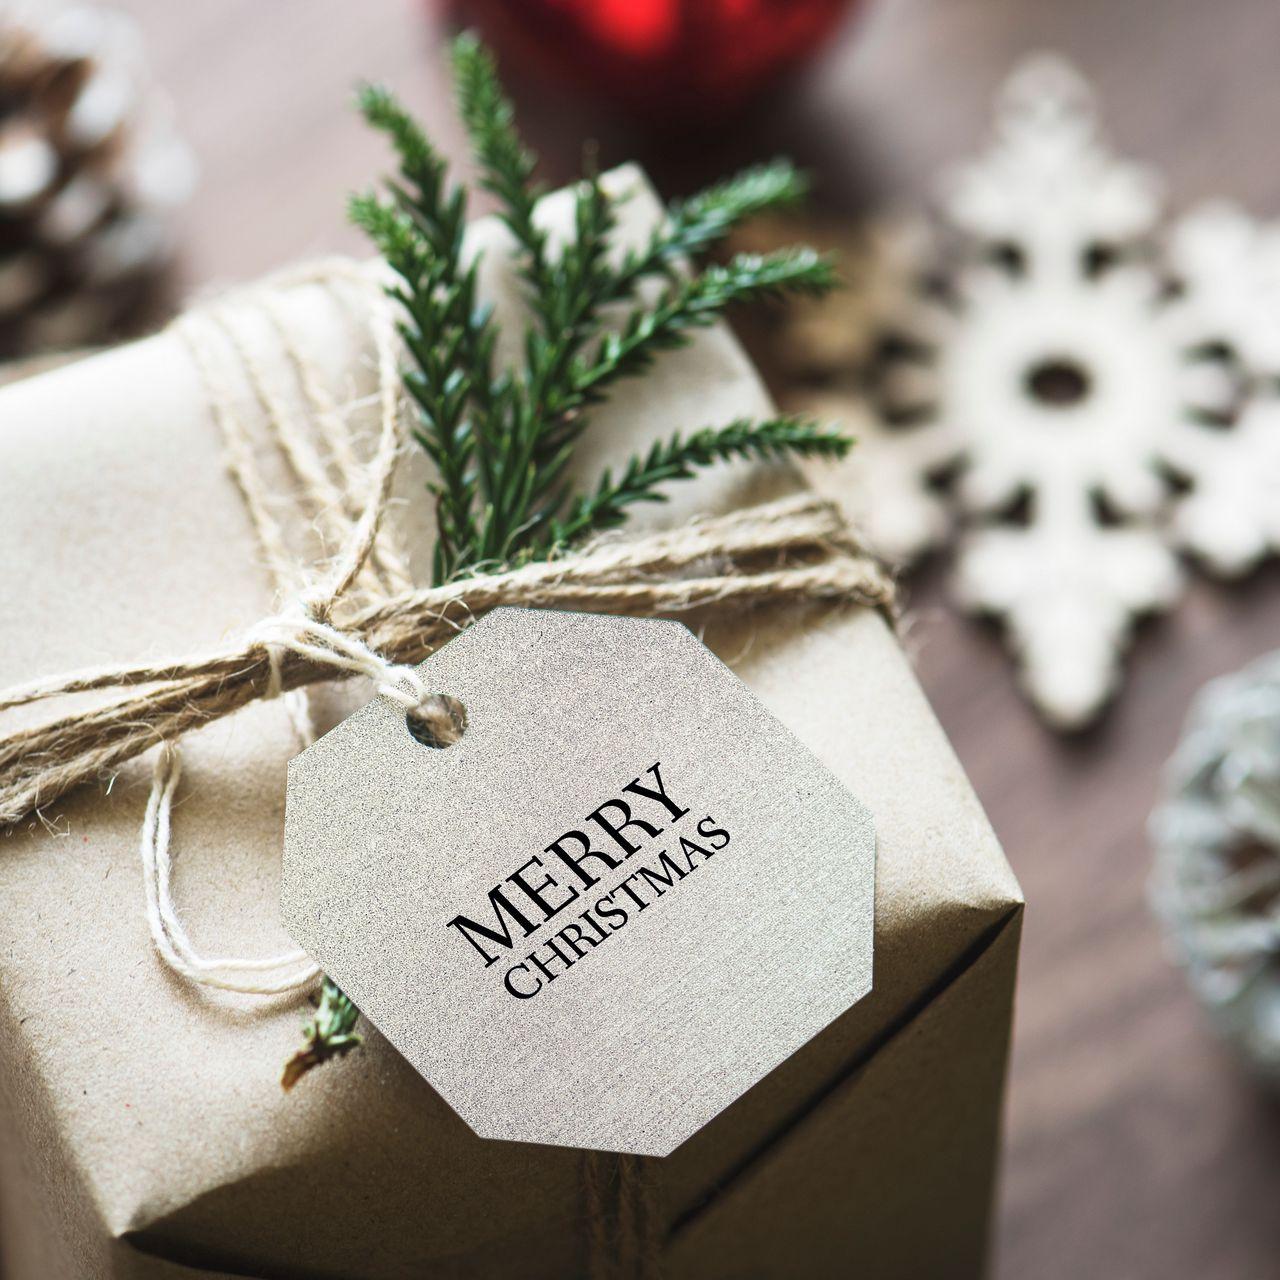 1280x1280 Wallpaper gift, christmas, new year, tag, box